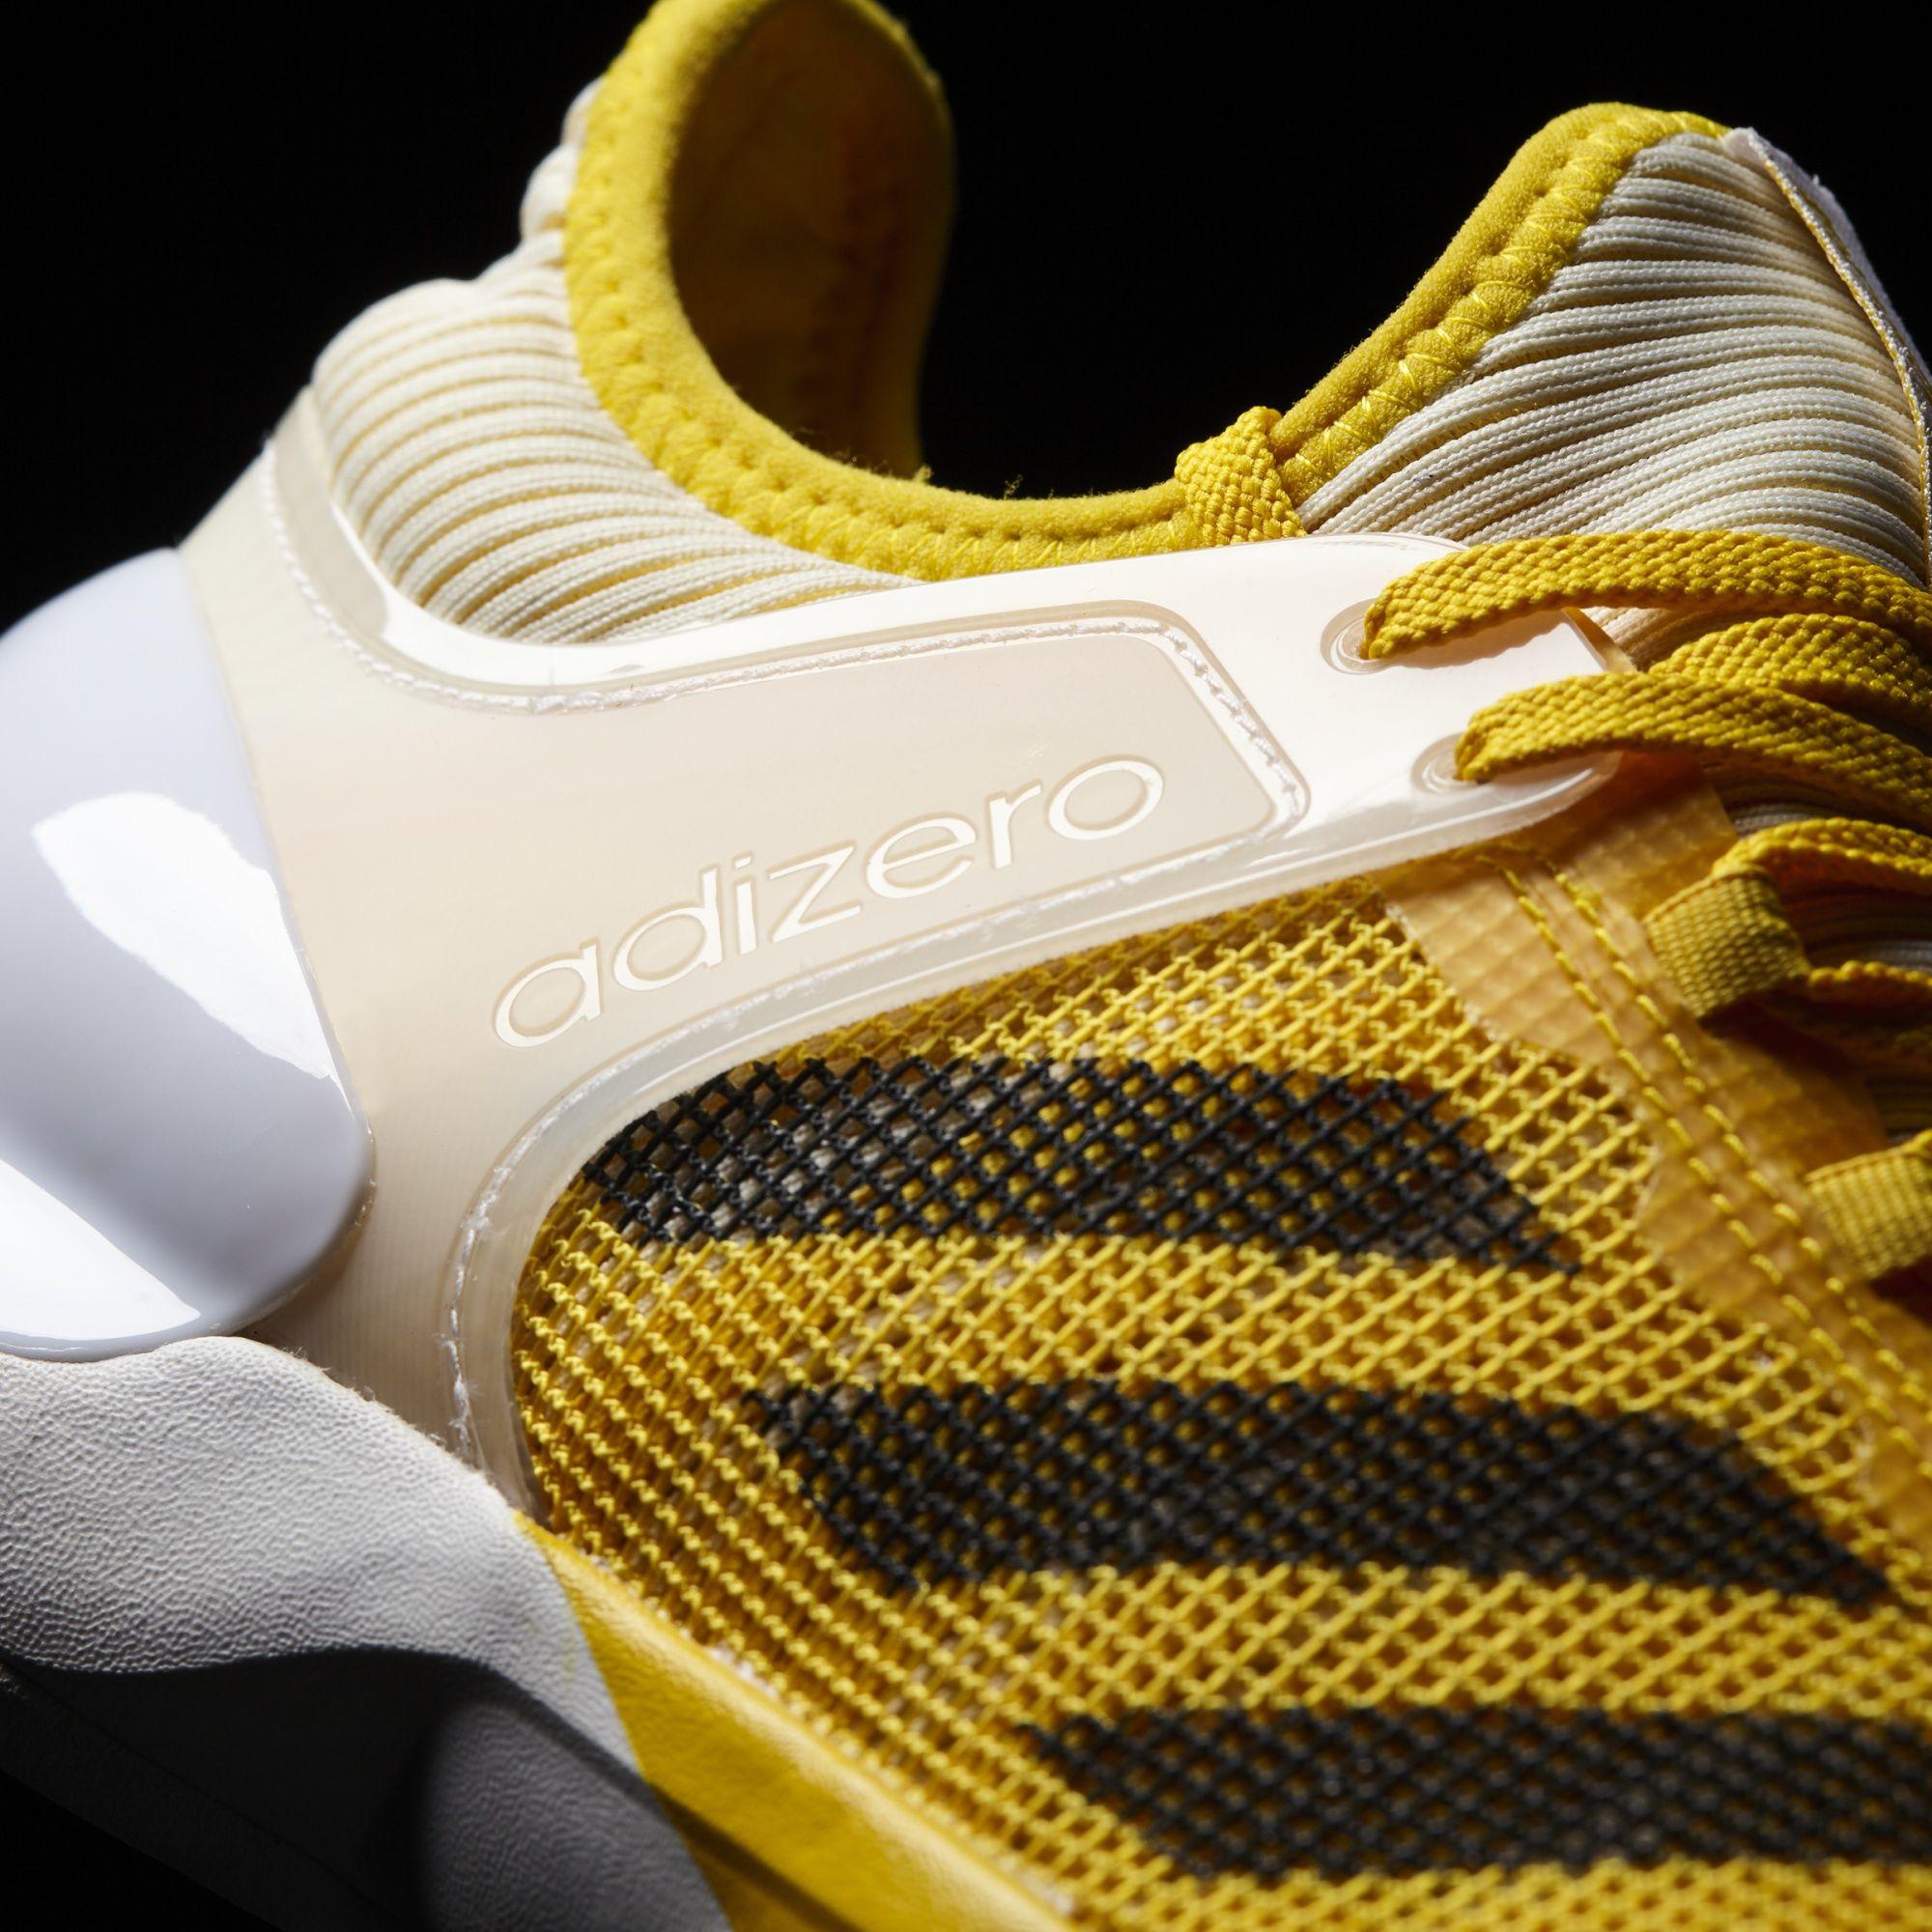 online retailer d6990 d602b adidas adizero Ubersonic 2 Tennis Shoes